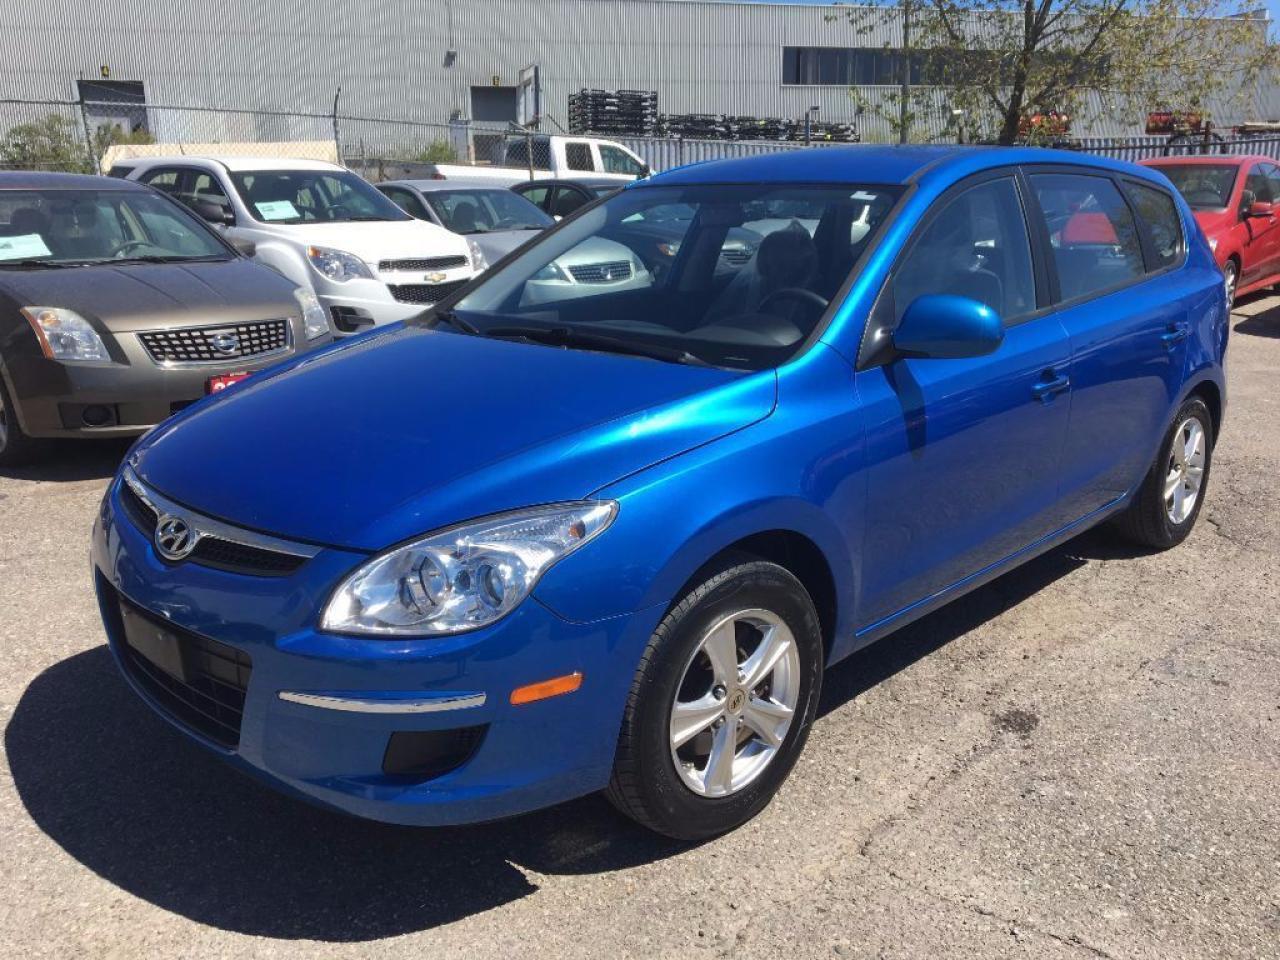 Photo of Blue 2010 Hyundai Elantra